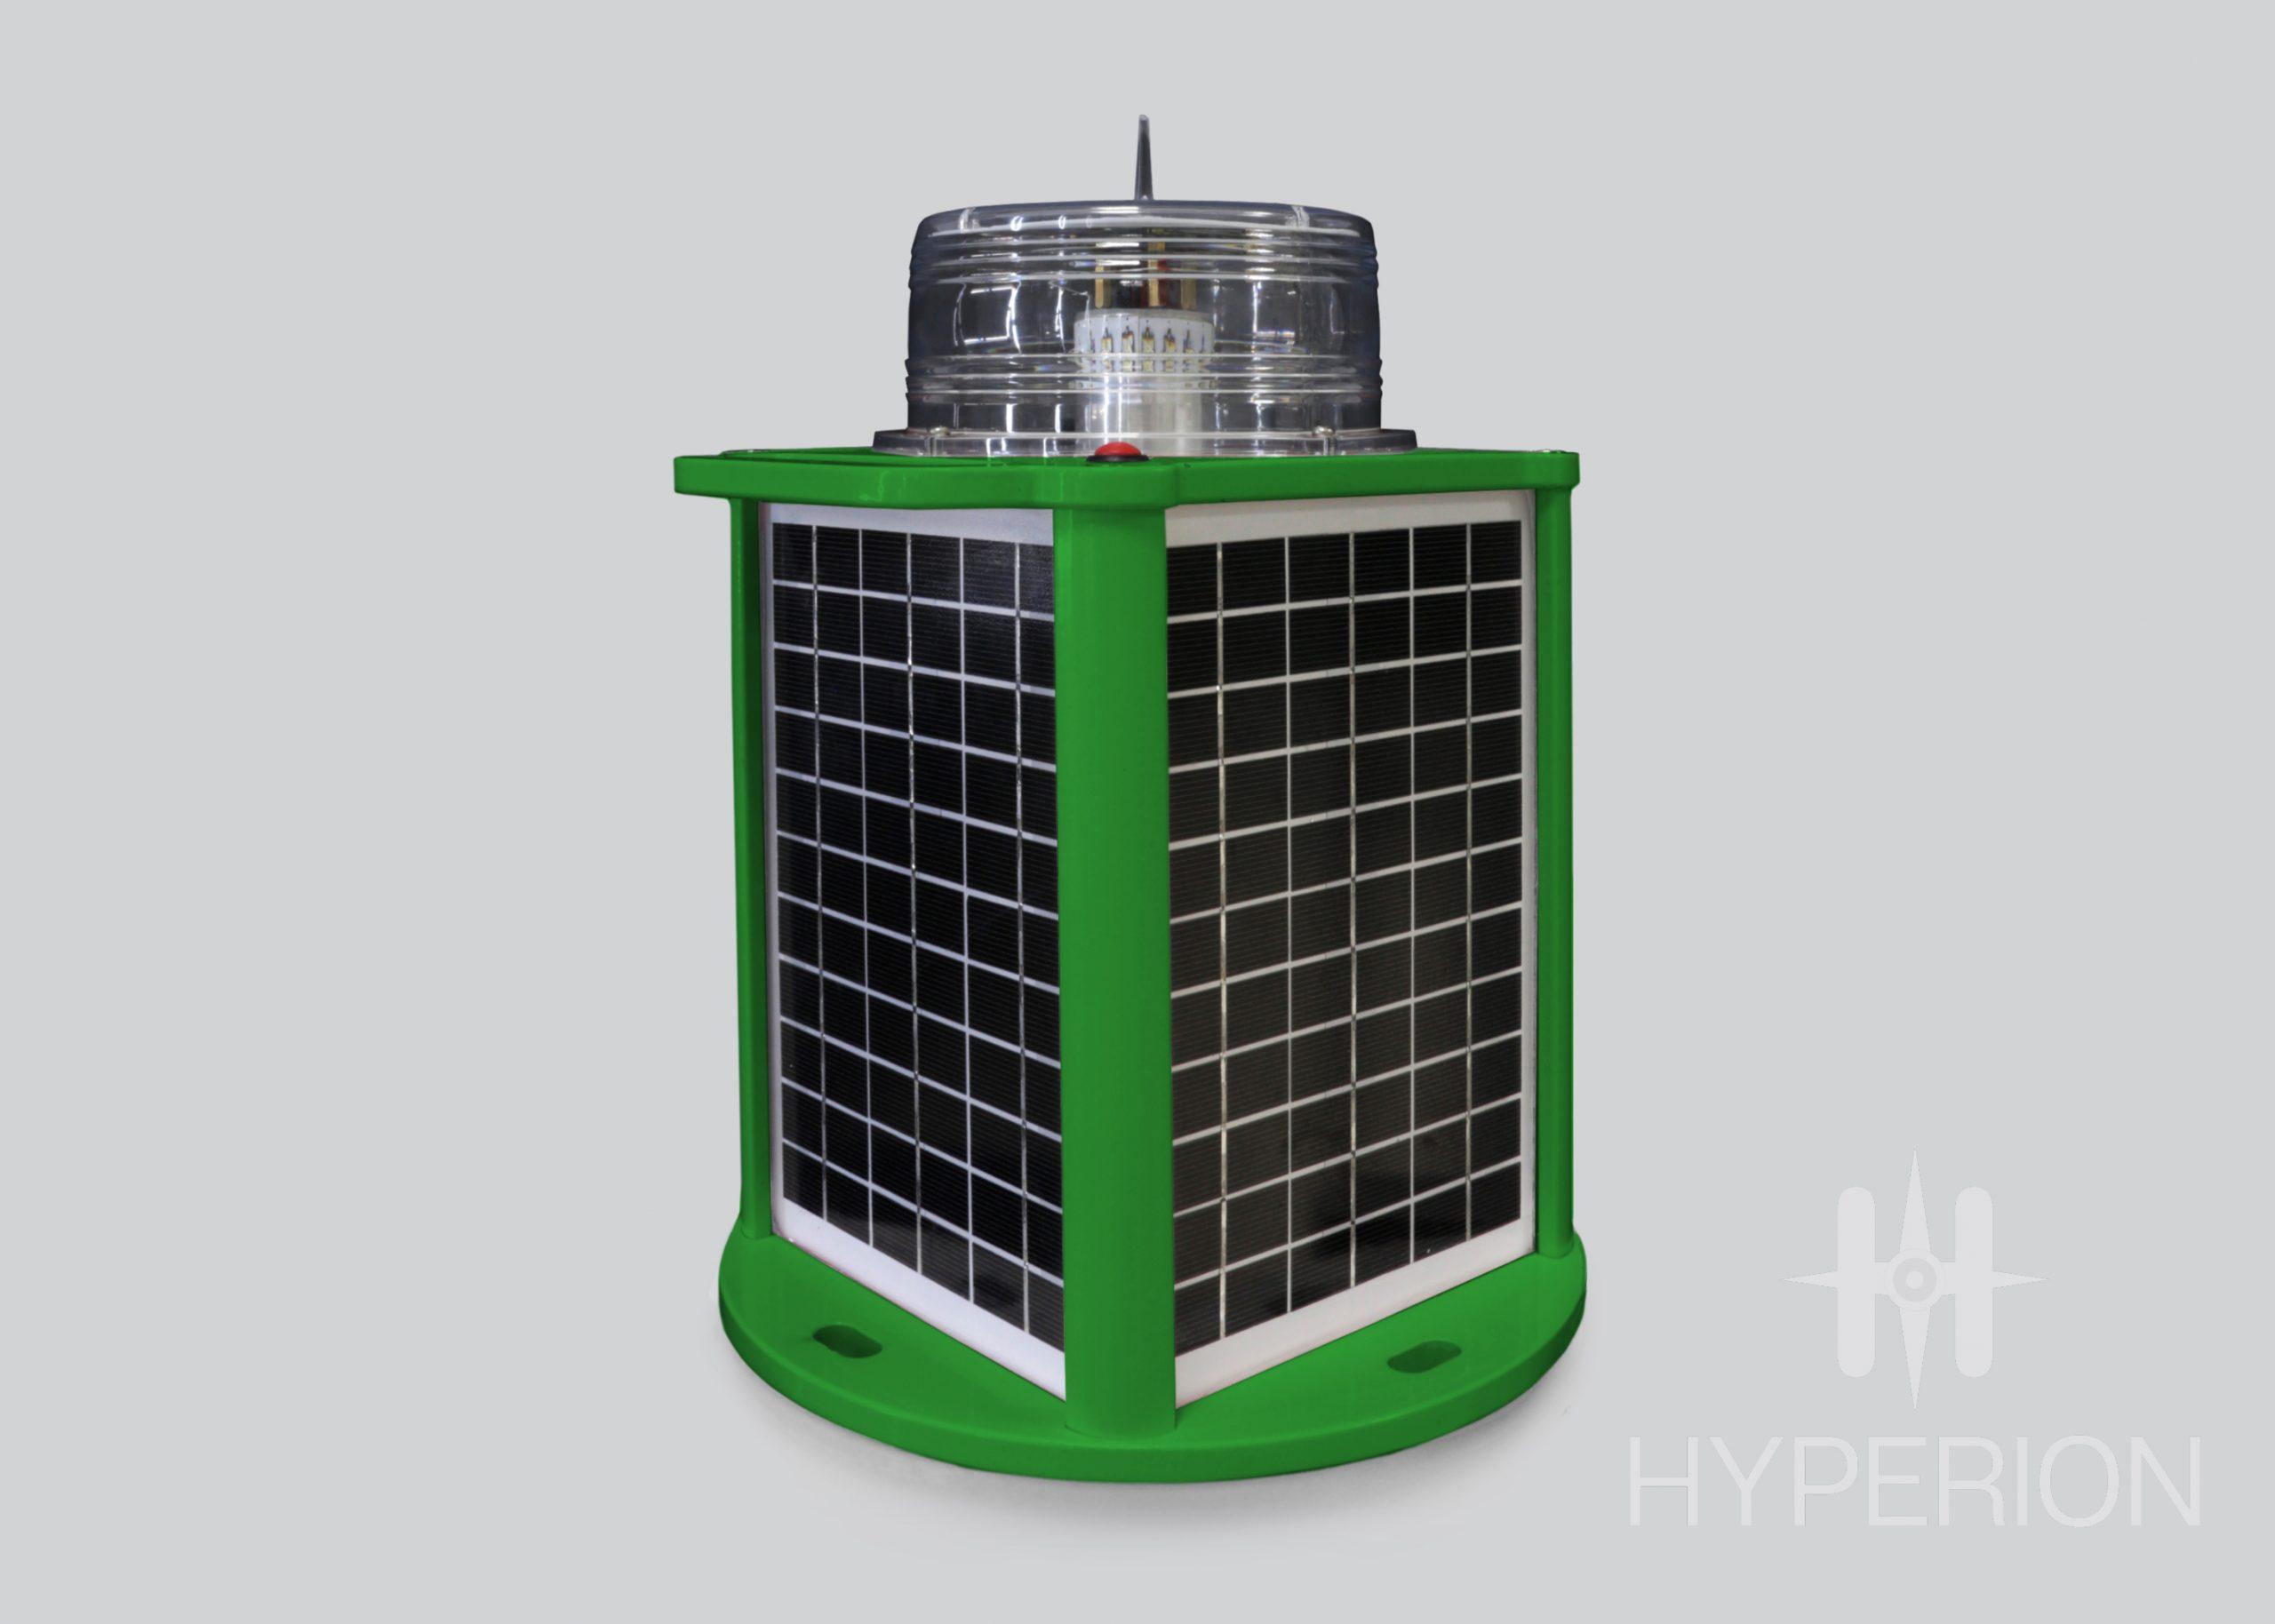 Hyperion HL-5